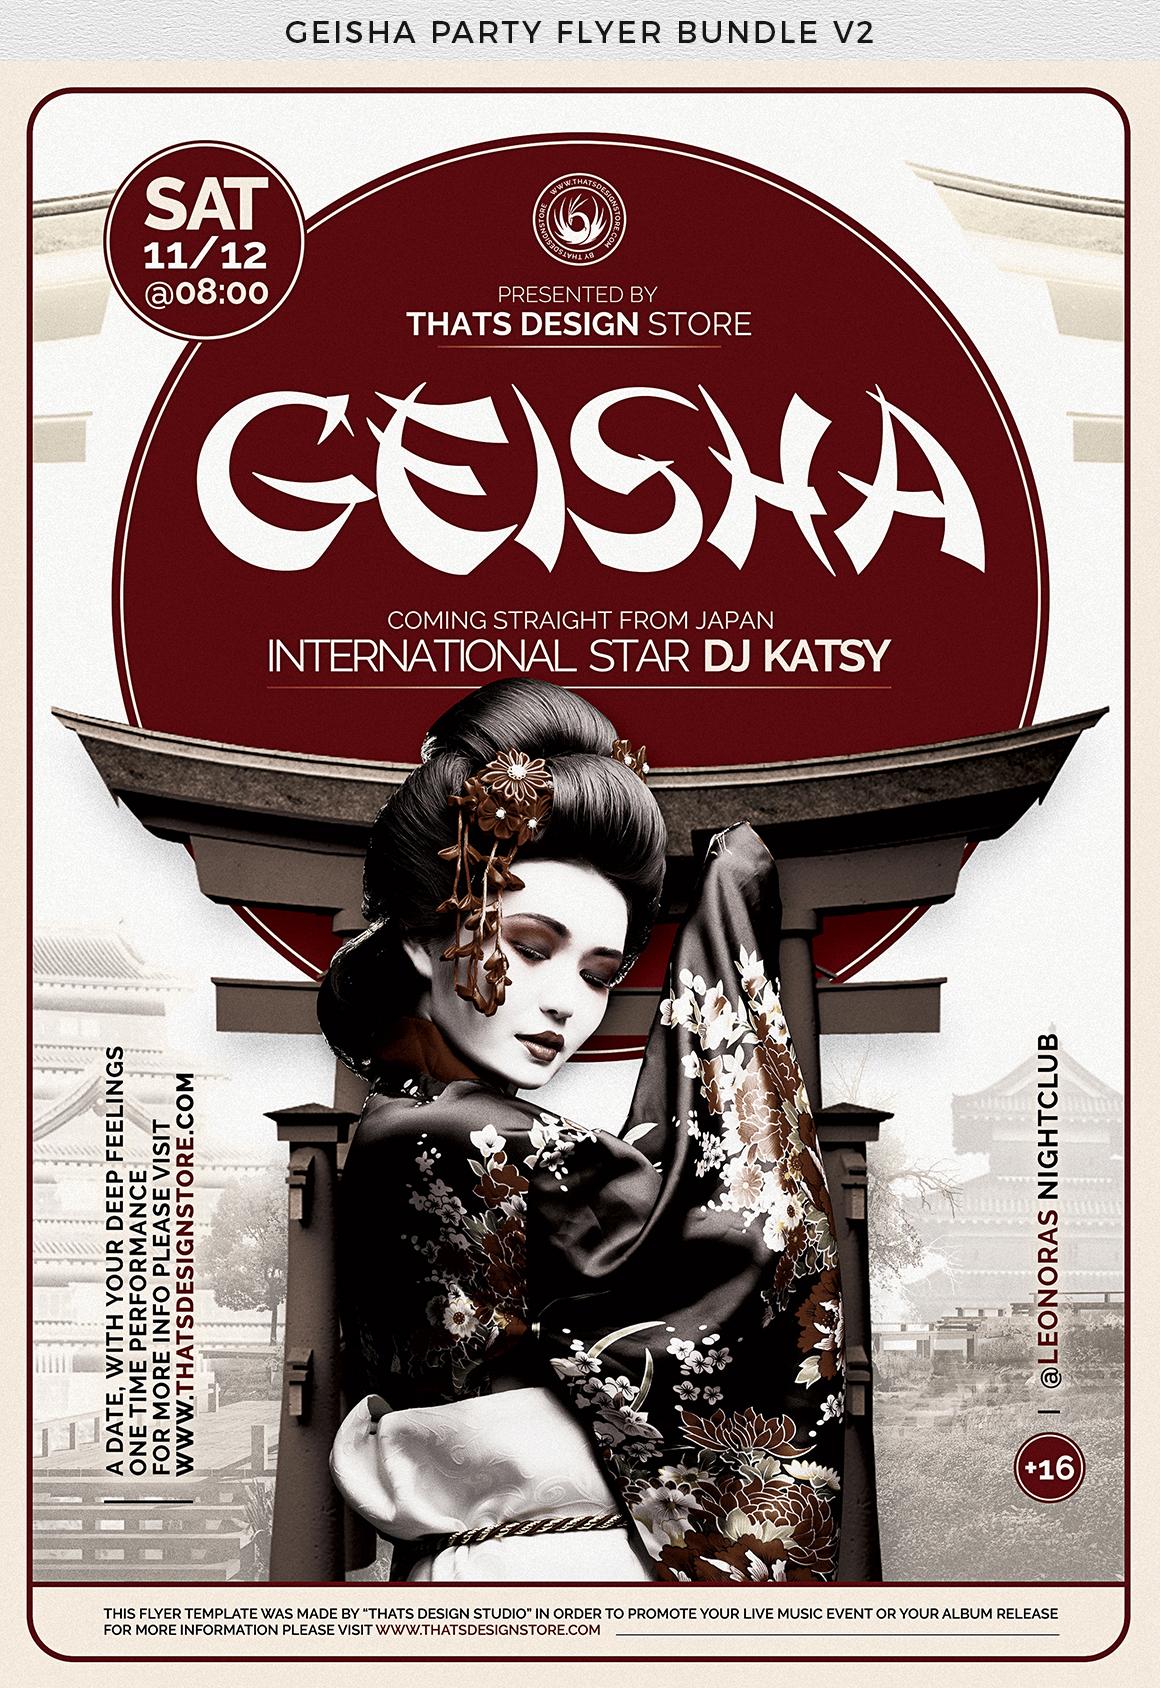 Geisha Party Flyer Bundle V2 example image 12